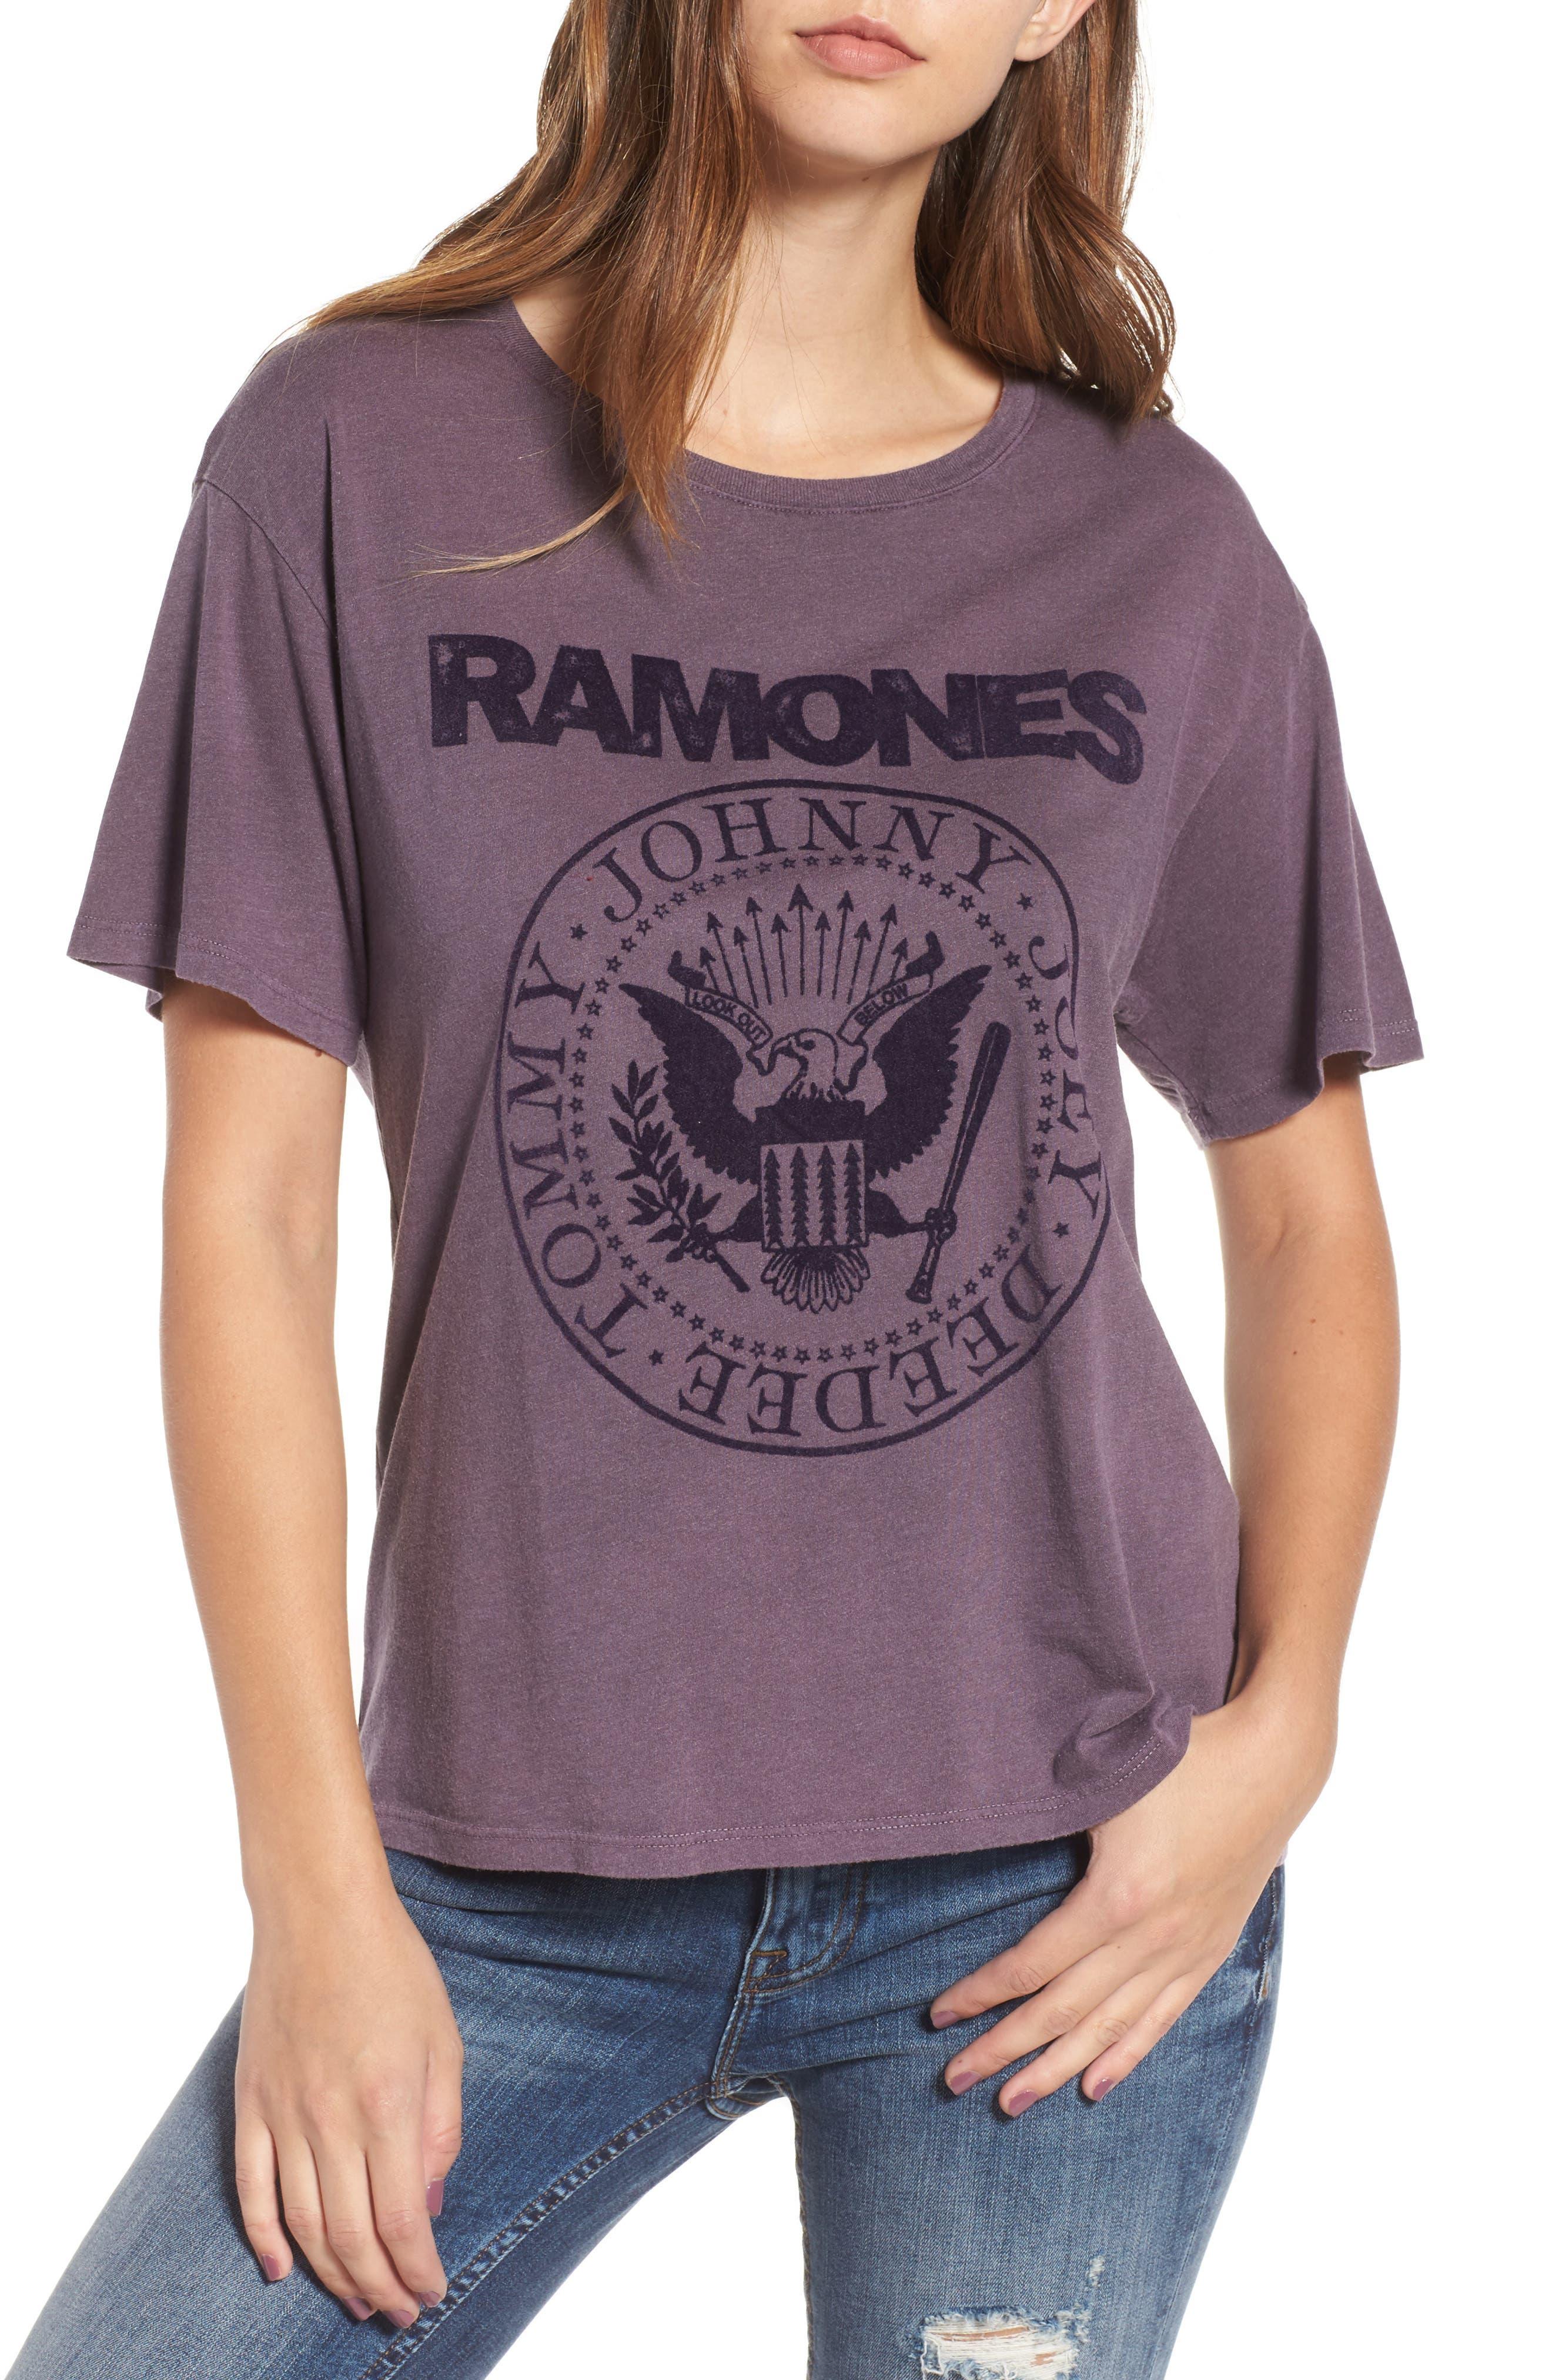 Ramones Tee,                         Main,                         color, Plum